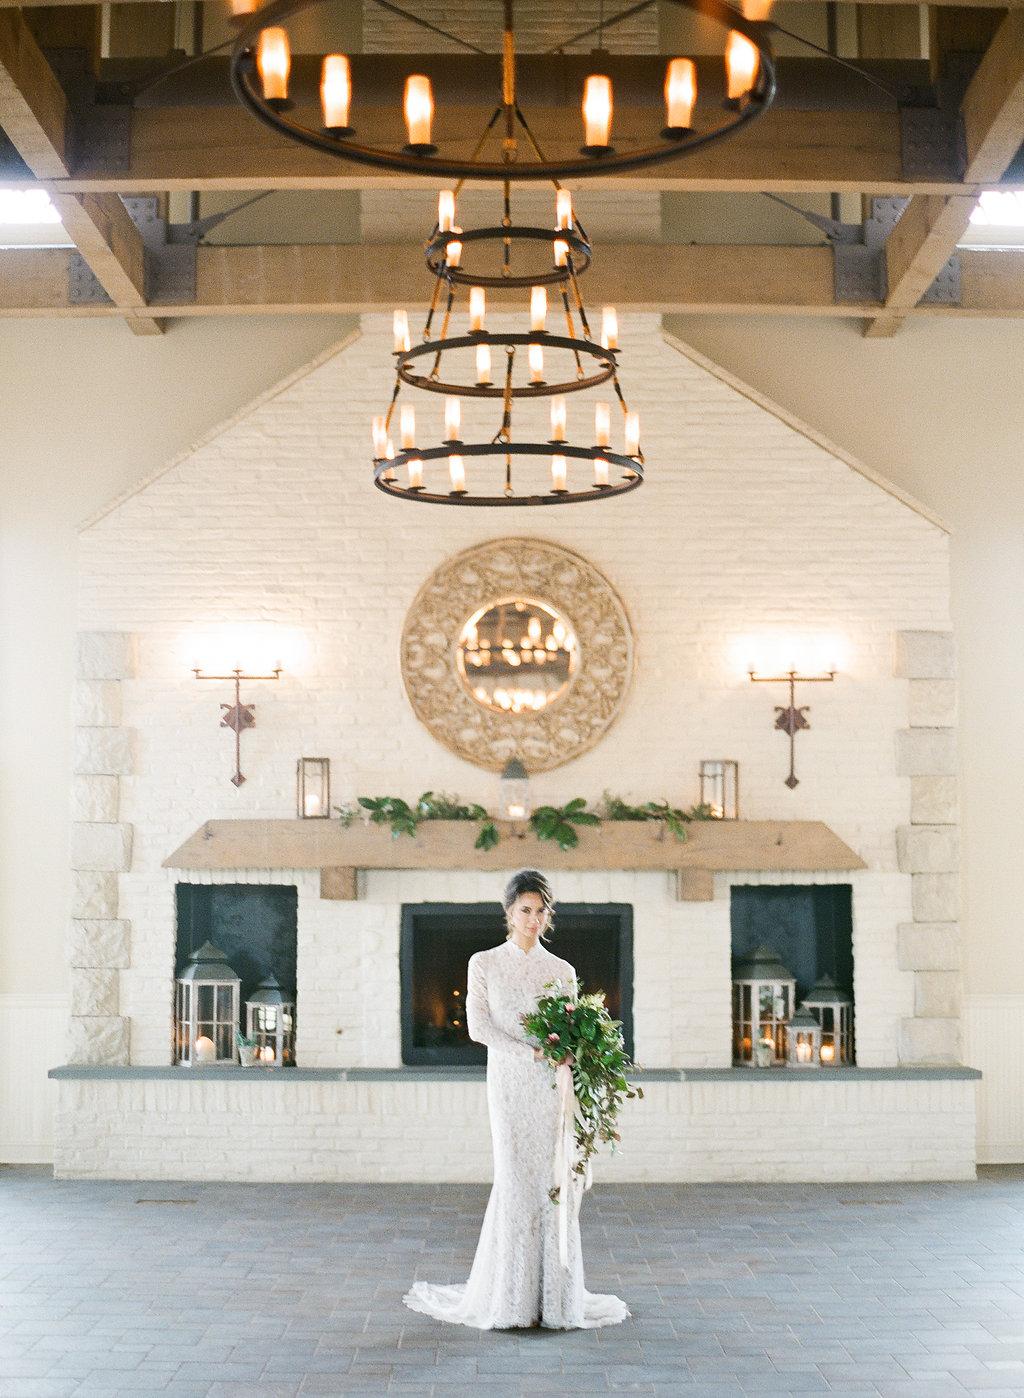 kristen_lynne_photography_early_mountain_vineyard_wedding-35